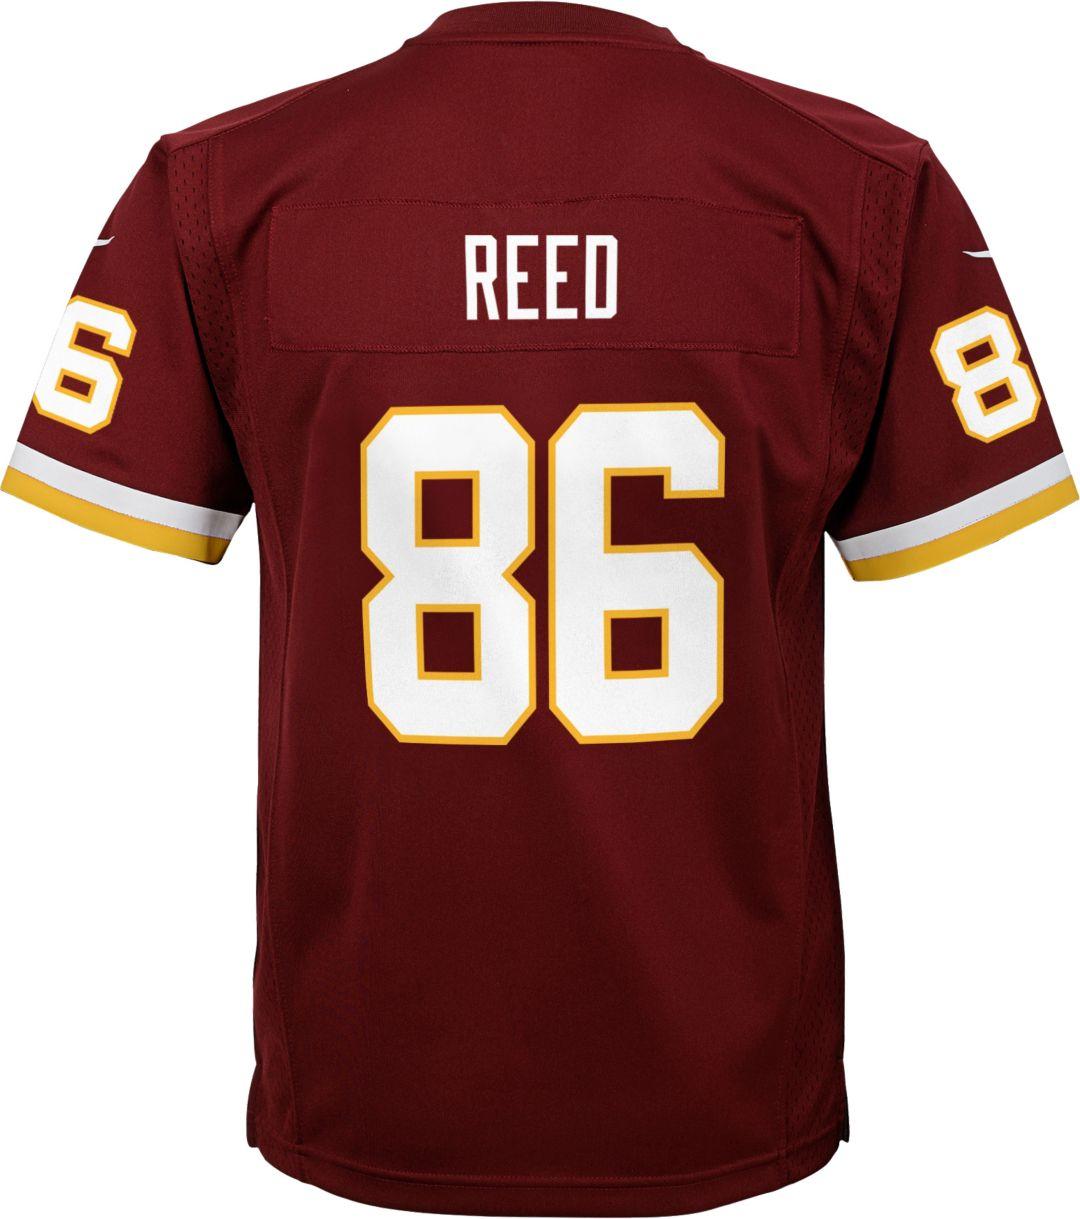 check out dcd7d c9aec Nike Youth Home Game Jersey Washington Redskins Jordan Reed #86